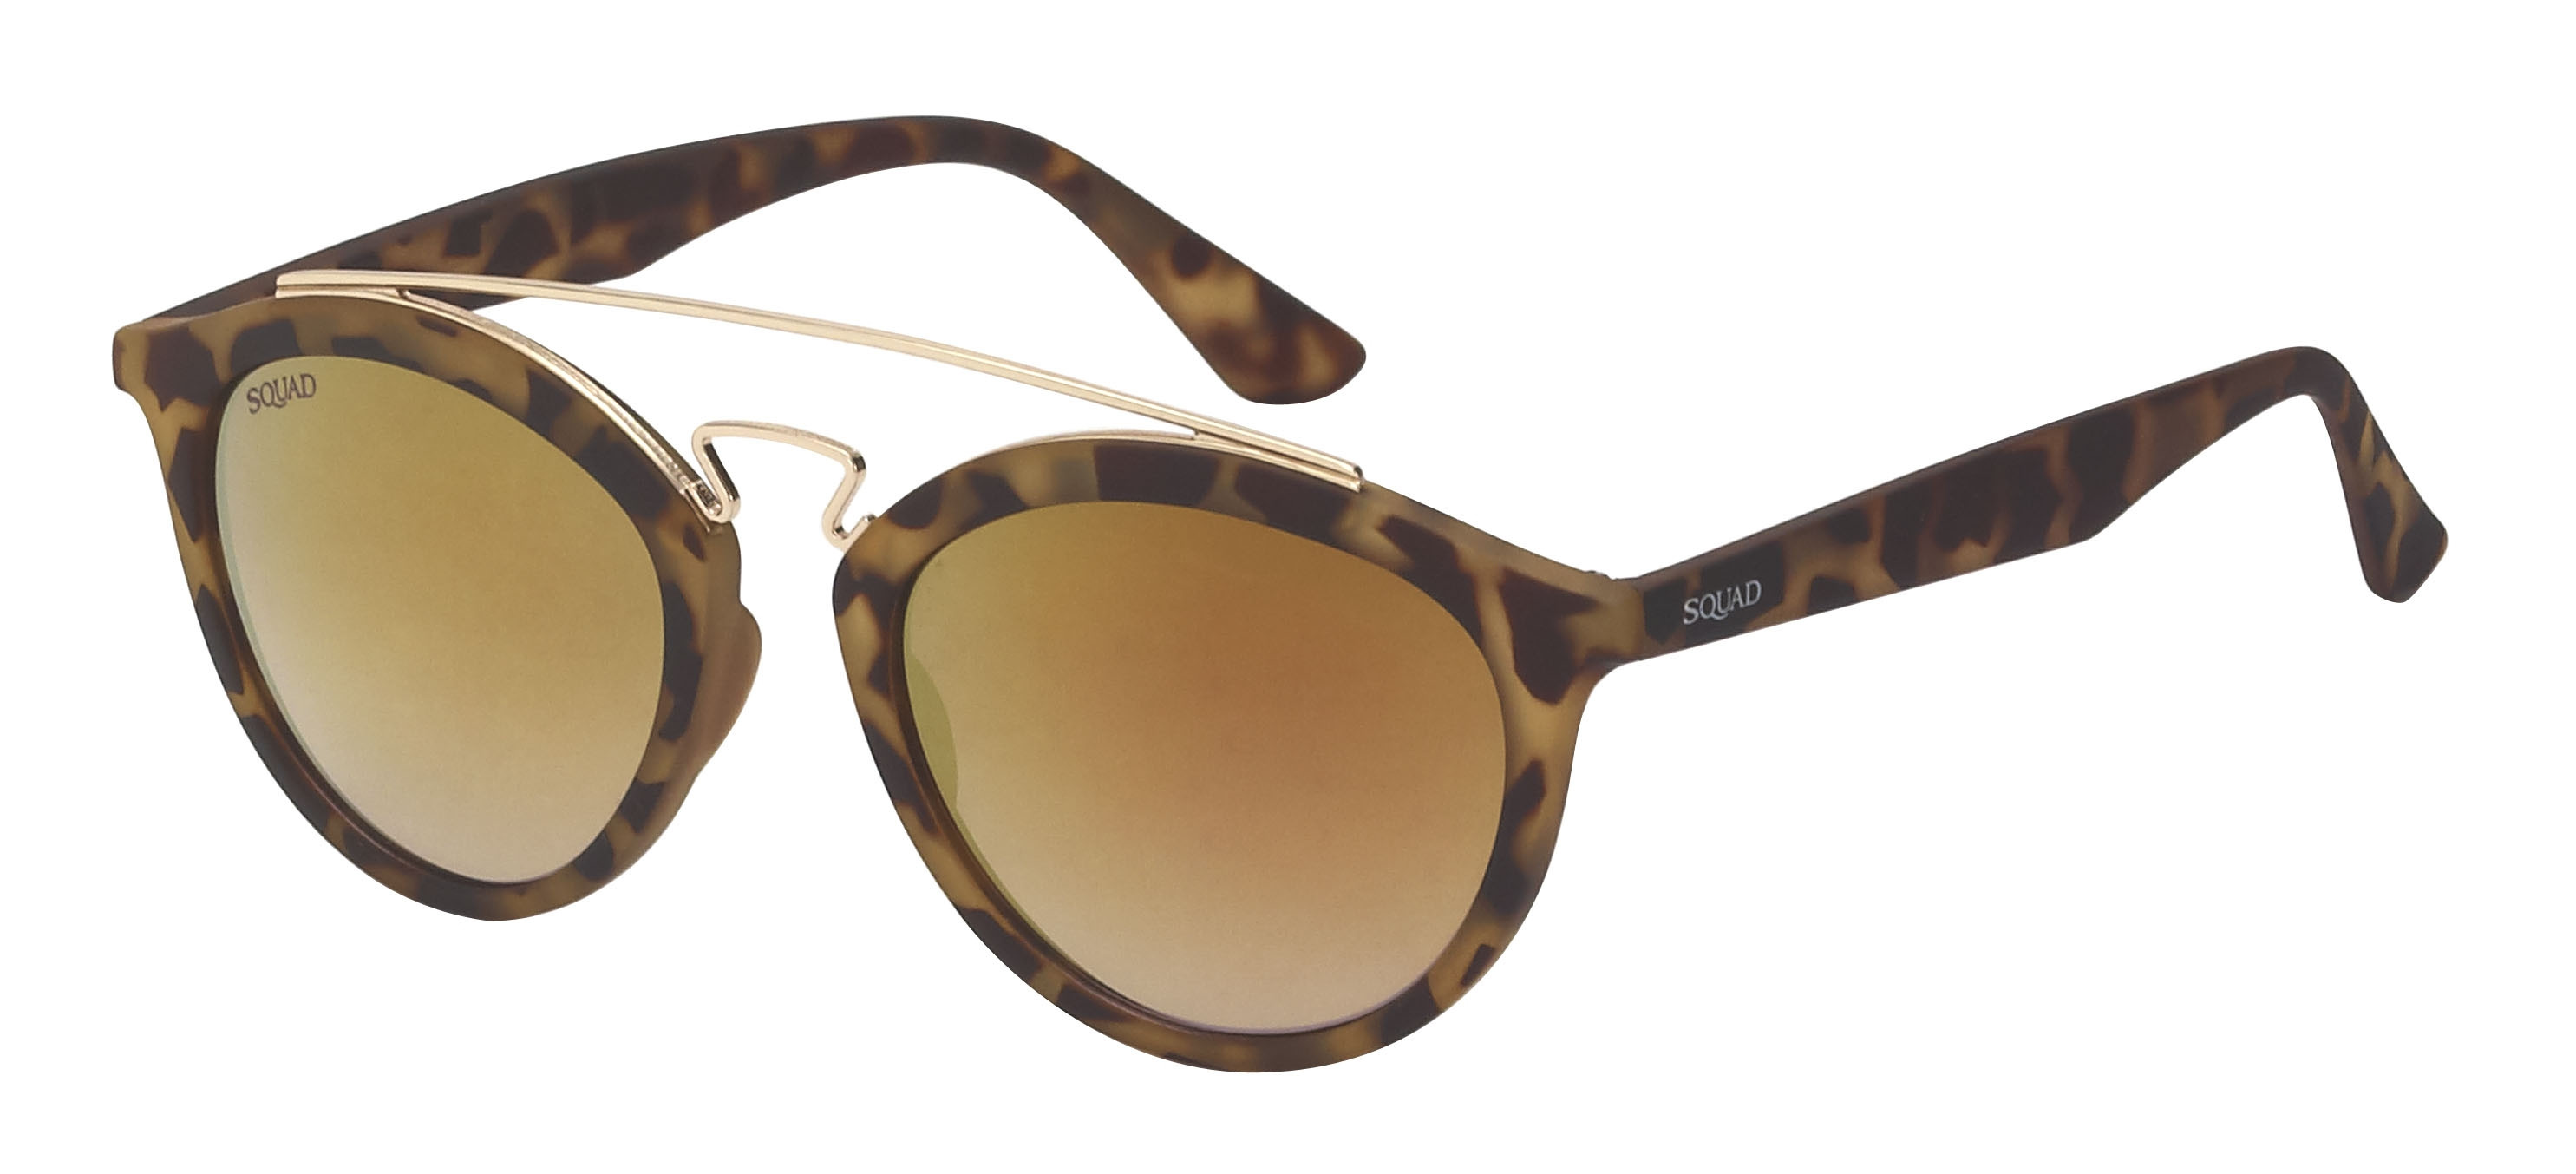 Gafas de sol SQUAD AS61146 C6